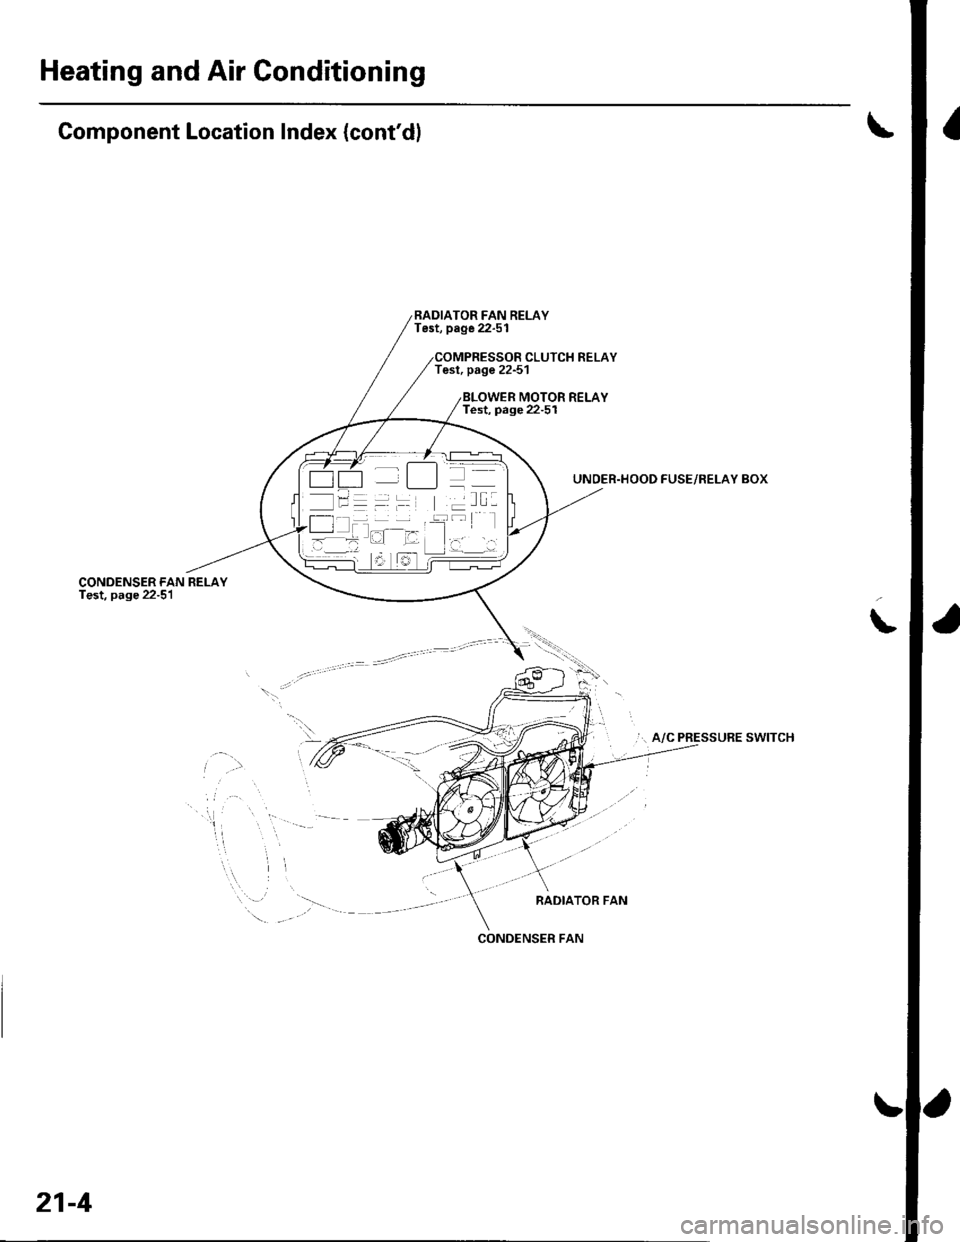 Honda Civic Cooling Fan Circuit